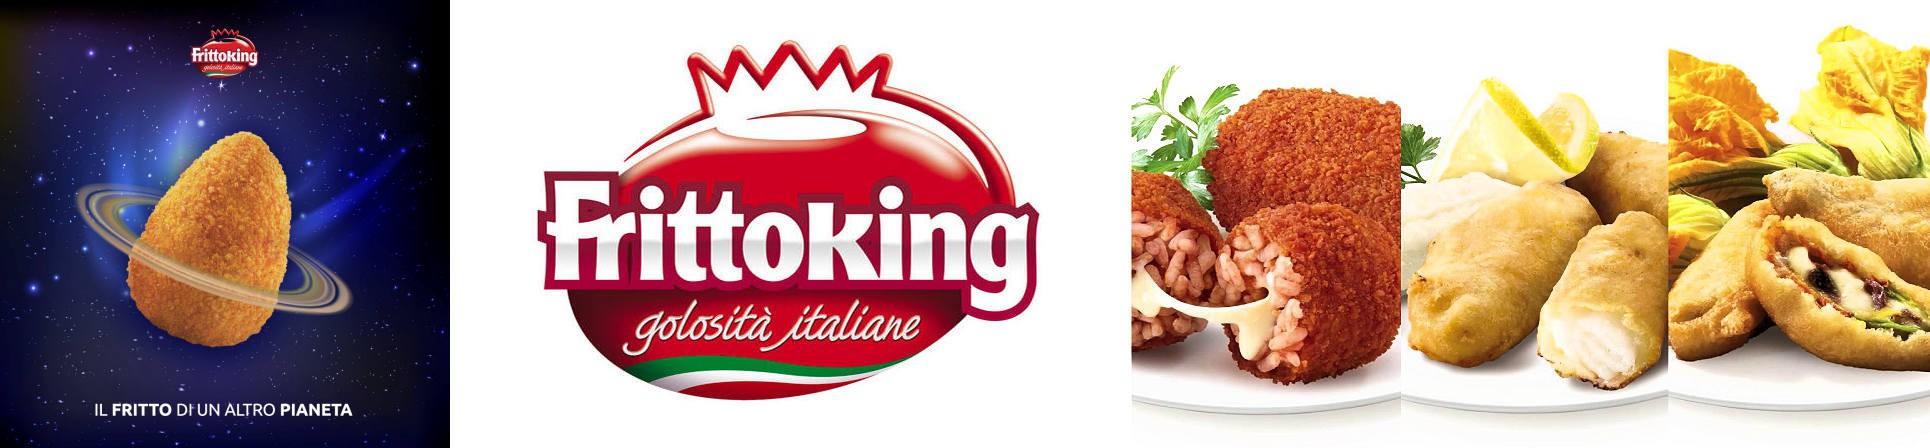 Vendita online fritto surgelato, supplì, arancini panati e verdure pastellate vendita online - FRITTOKING